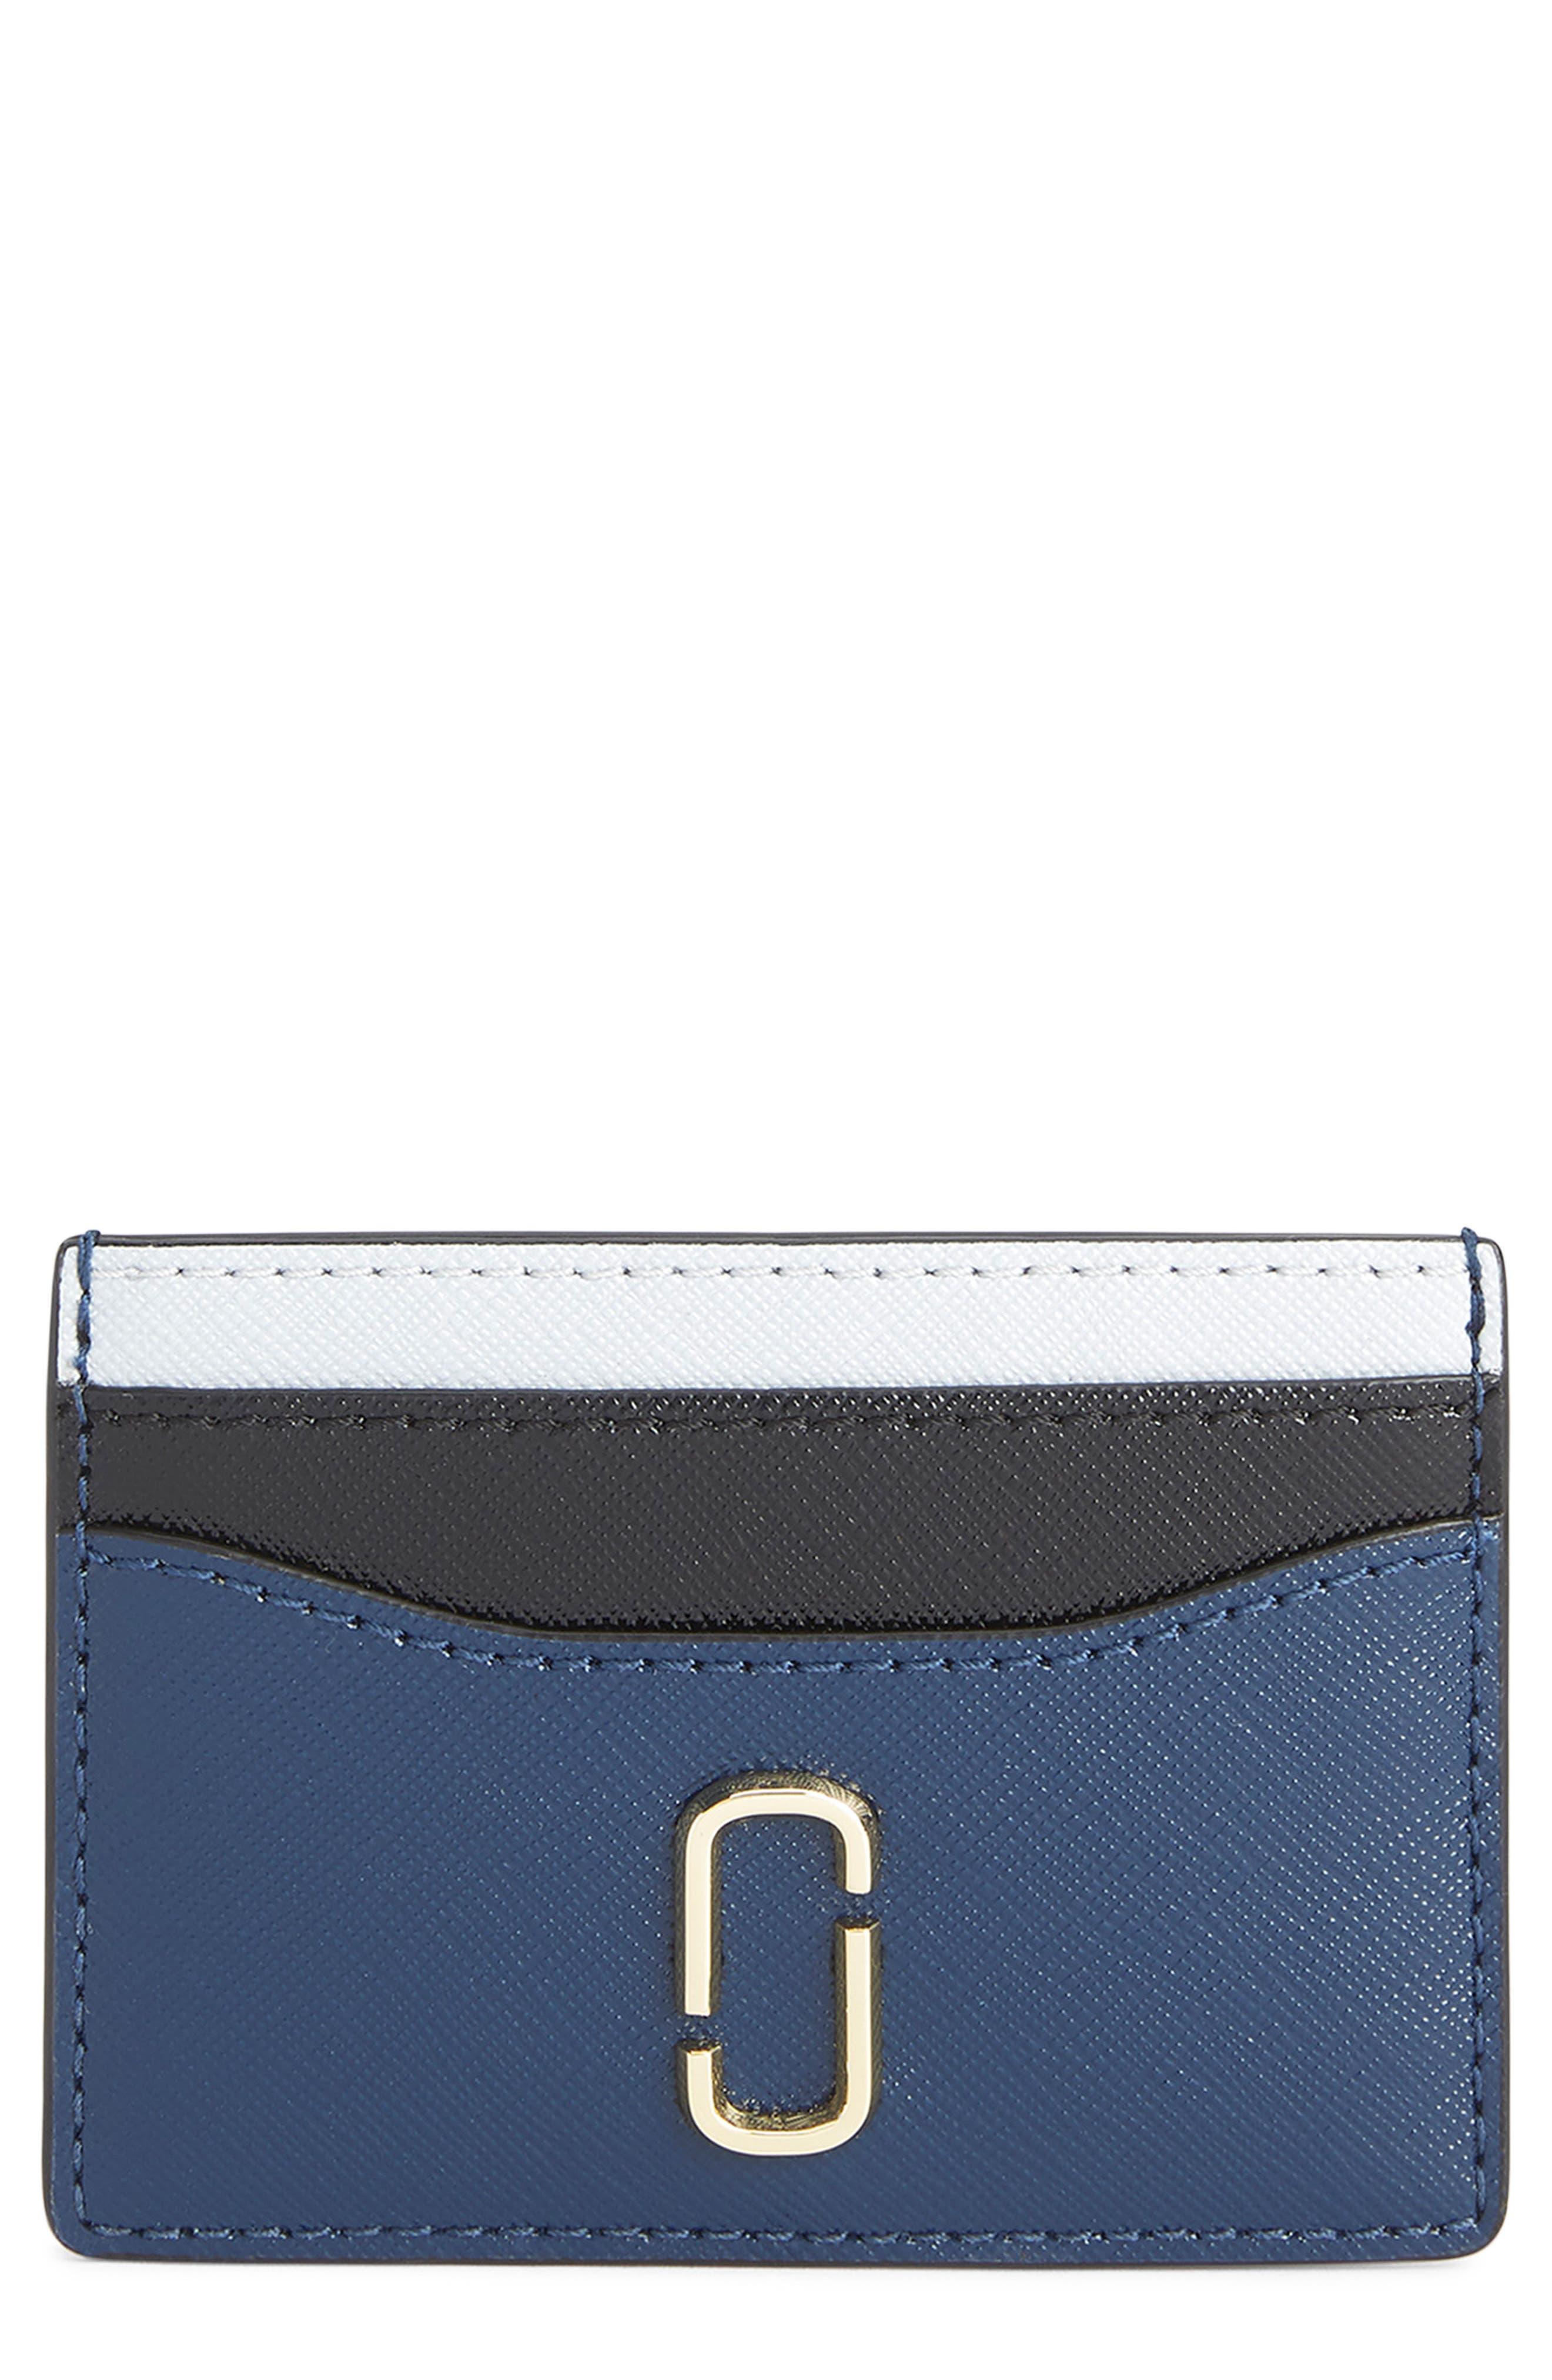 Snapshot Saffiano Leather Card Case,                         Main,                         color, BLUE SEA MULTI